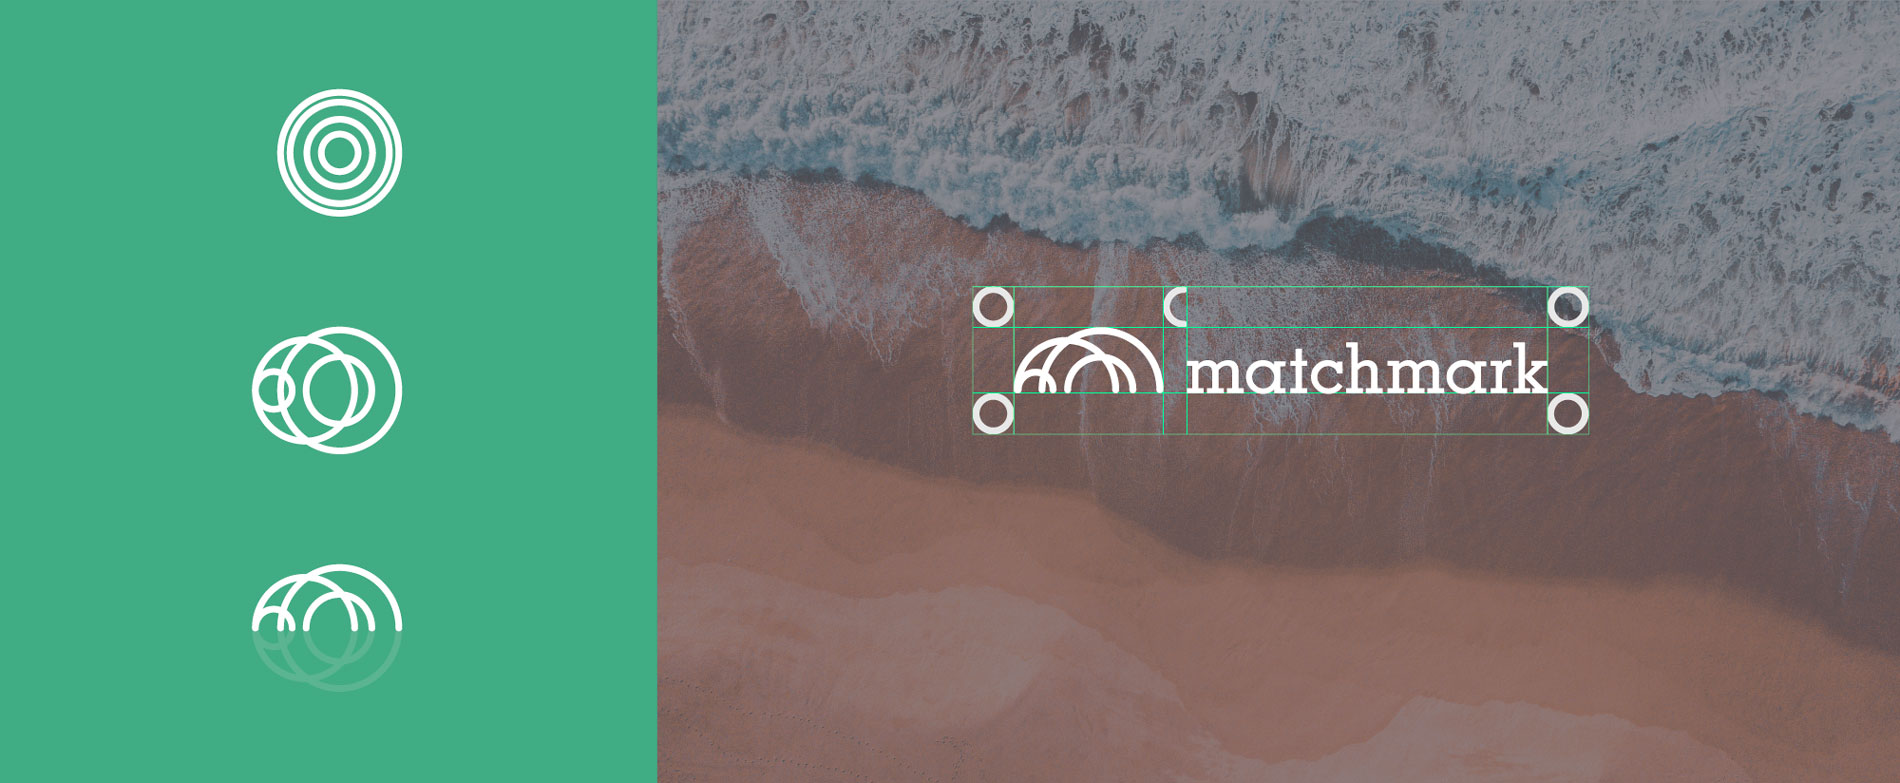 galery2-matchmark-activemedia